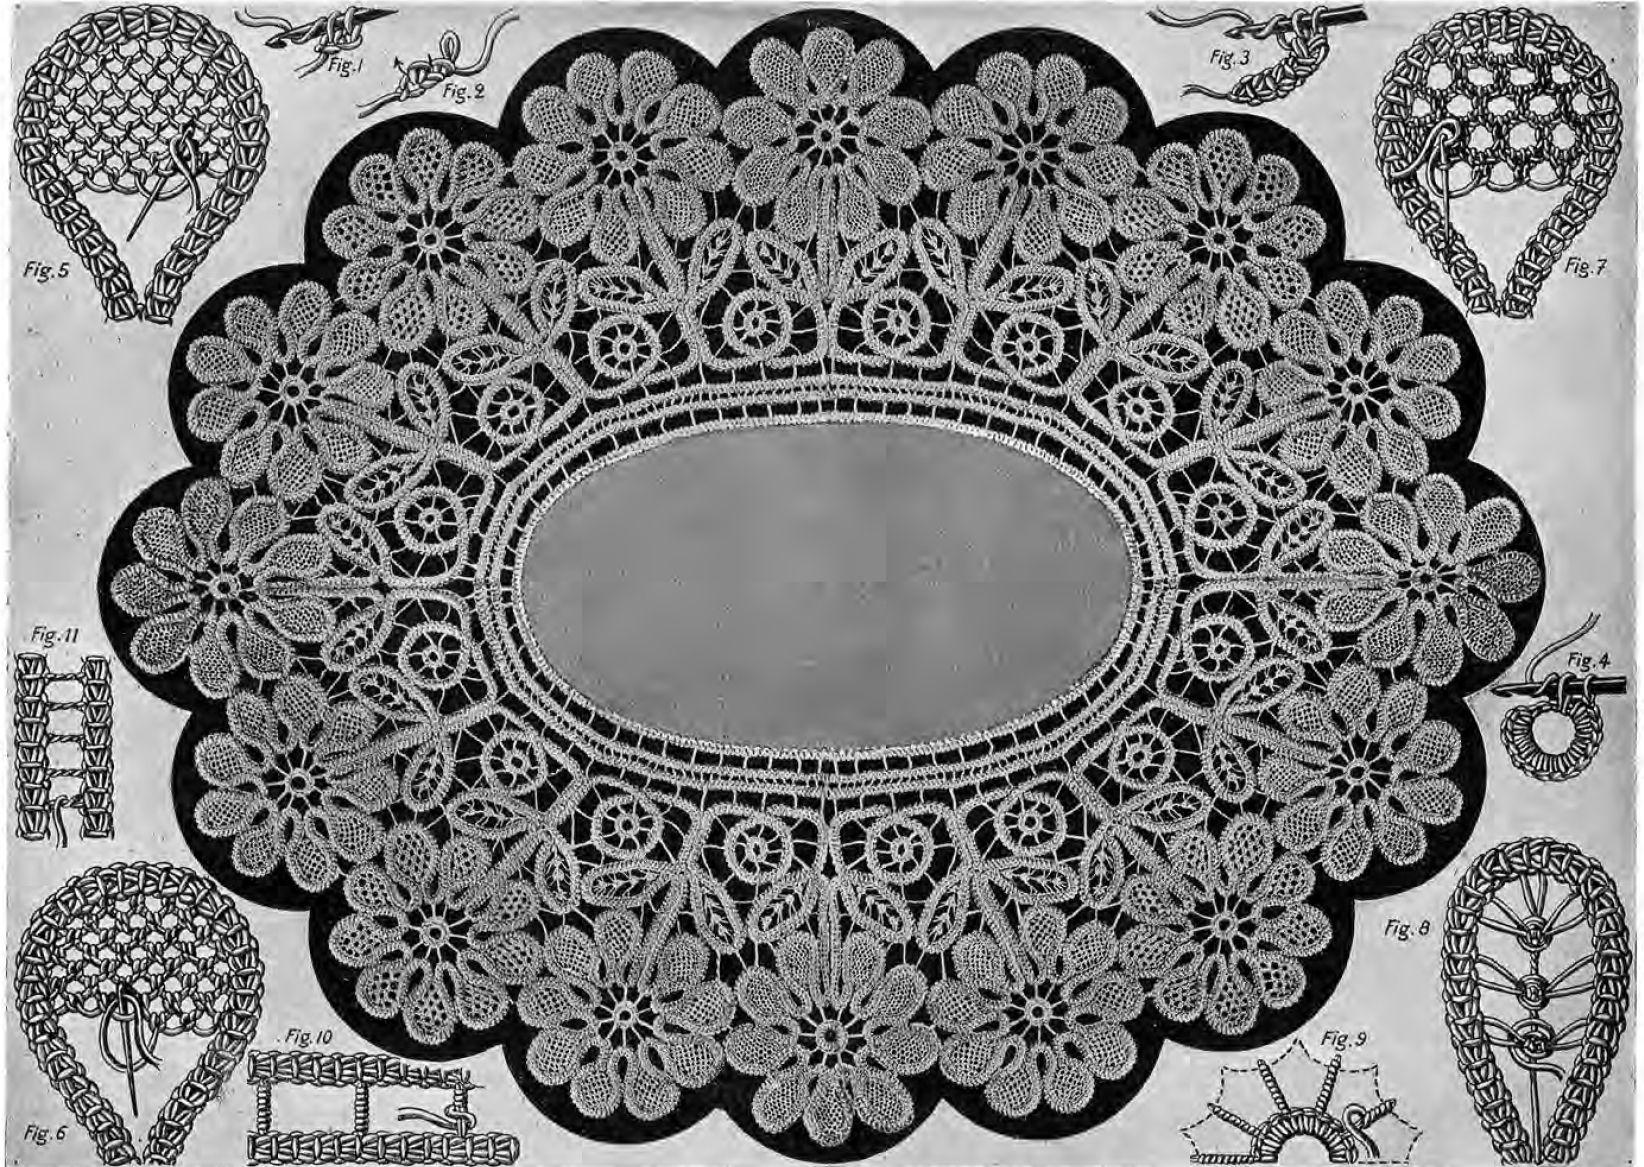 190 best crochet lace books images on pinterest crocheted lace carter bresson crochet et milan similar to romanian point lace crochet crochet cord with needle lace fillings free pattern book gros crochet from bankloansurffo Gallery